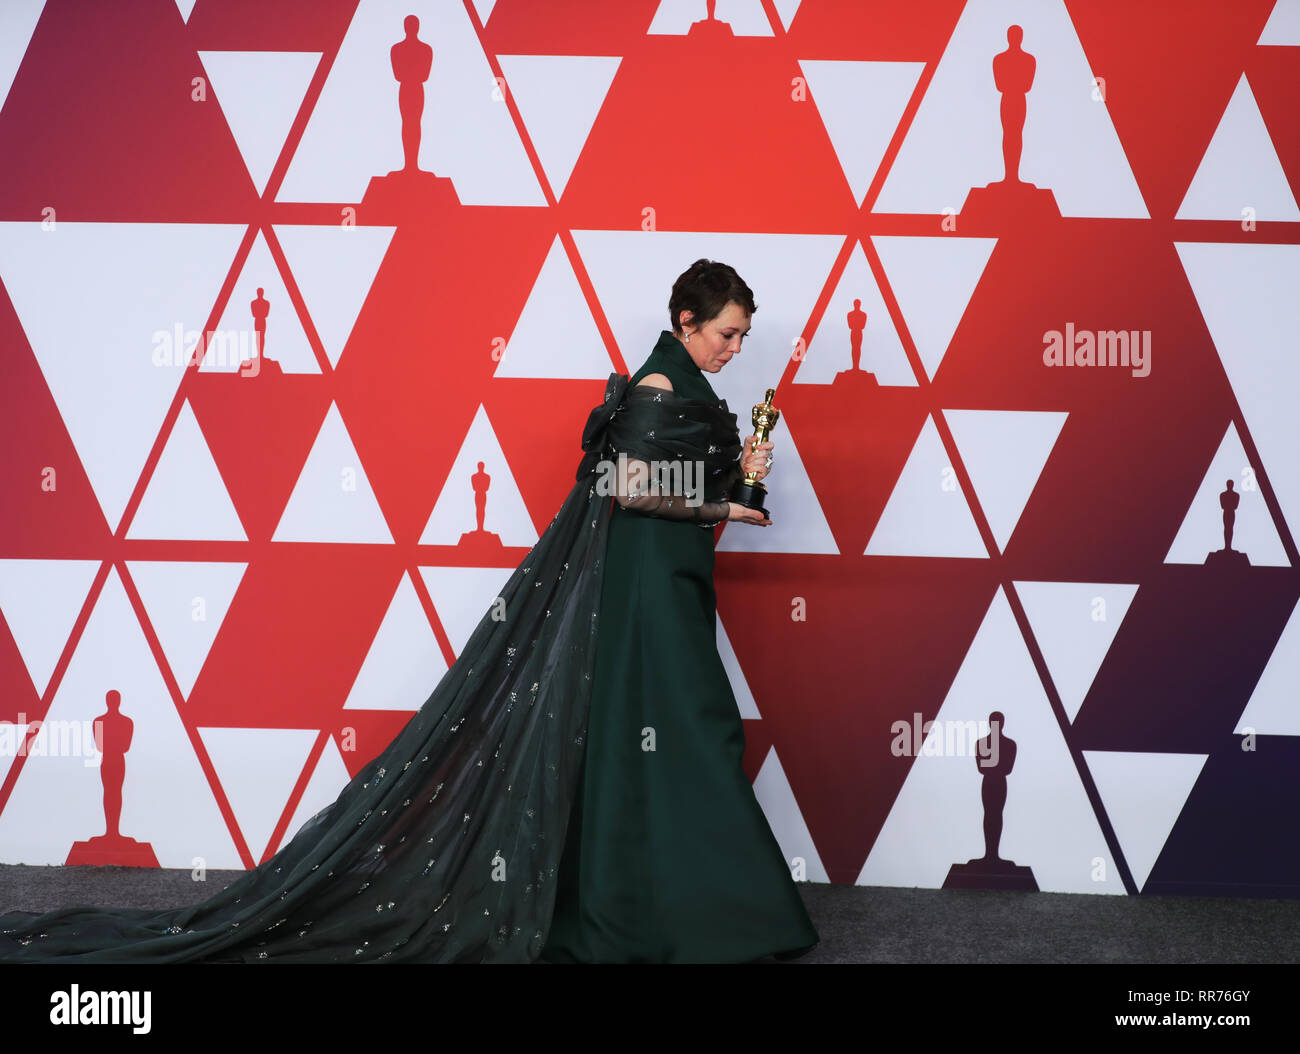 Los Angeles, USA  24th Feb, 2019  Olivia Colman poses for